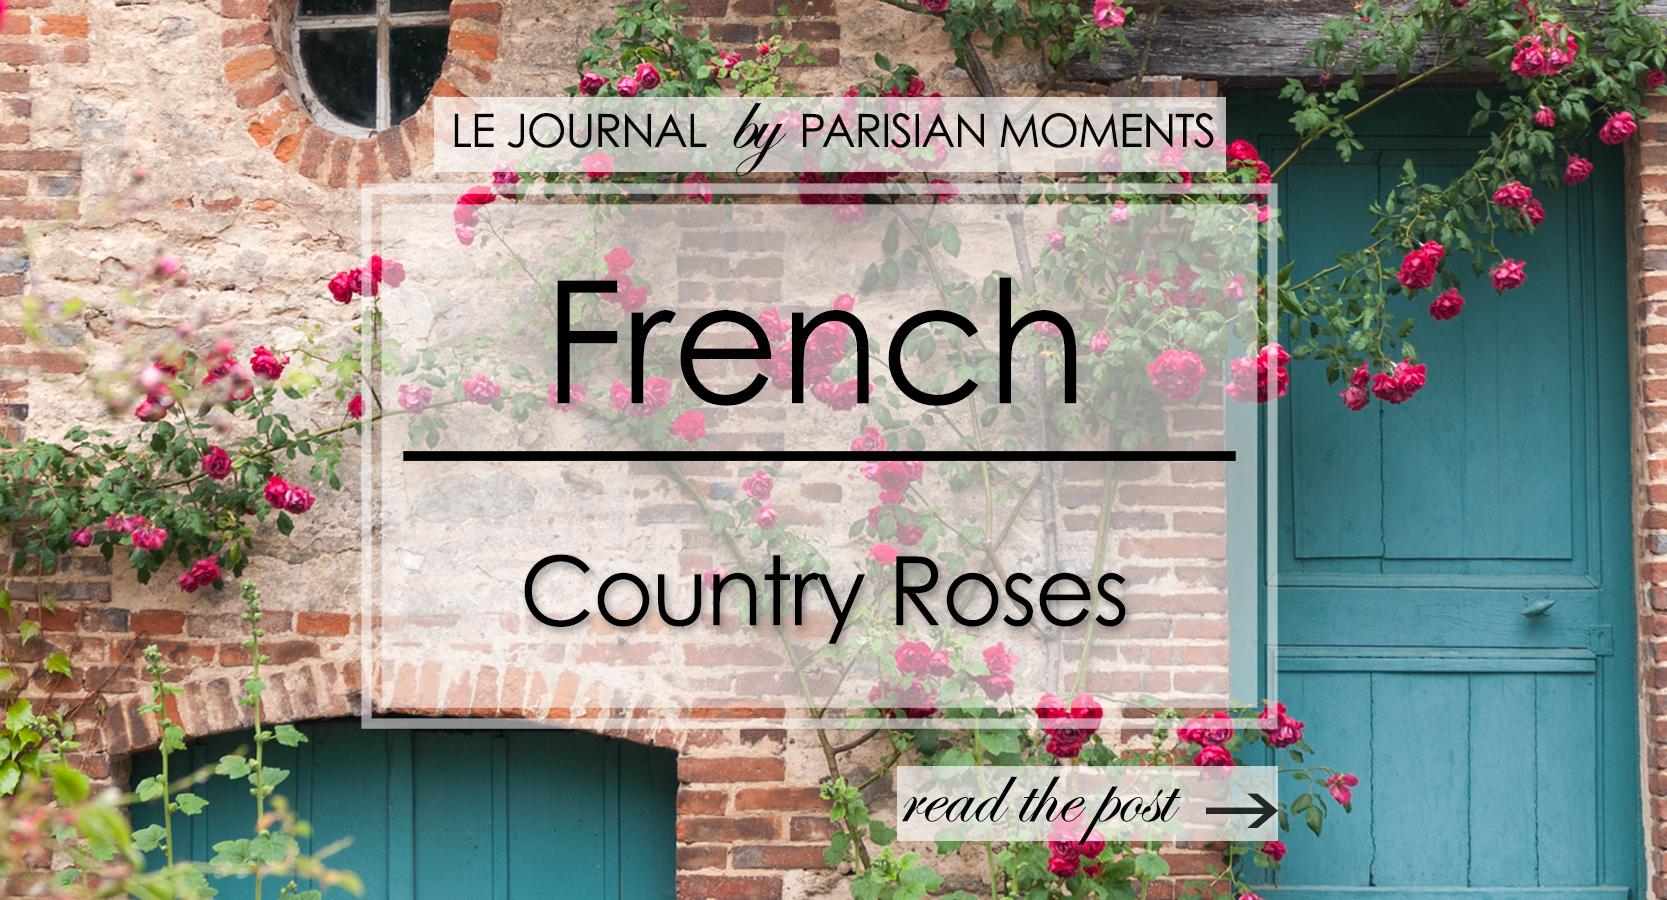 FrenchCountryRoses.jpg